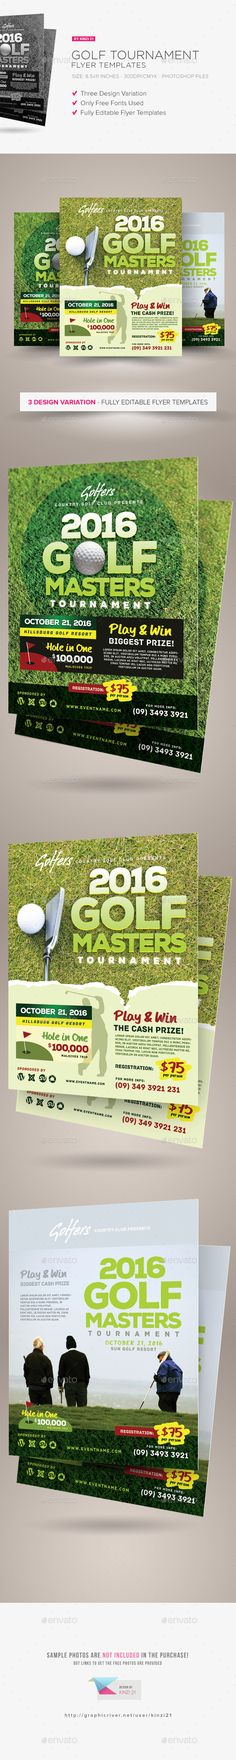 Golf Tournament Flyer Template PSD #design Download: http://graphicriver.net/item/golf-tournament-flyer-templates/12923199?ref=ksioks